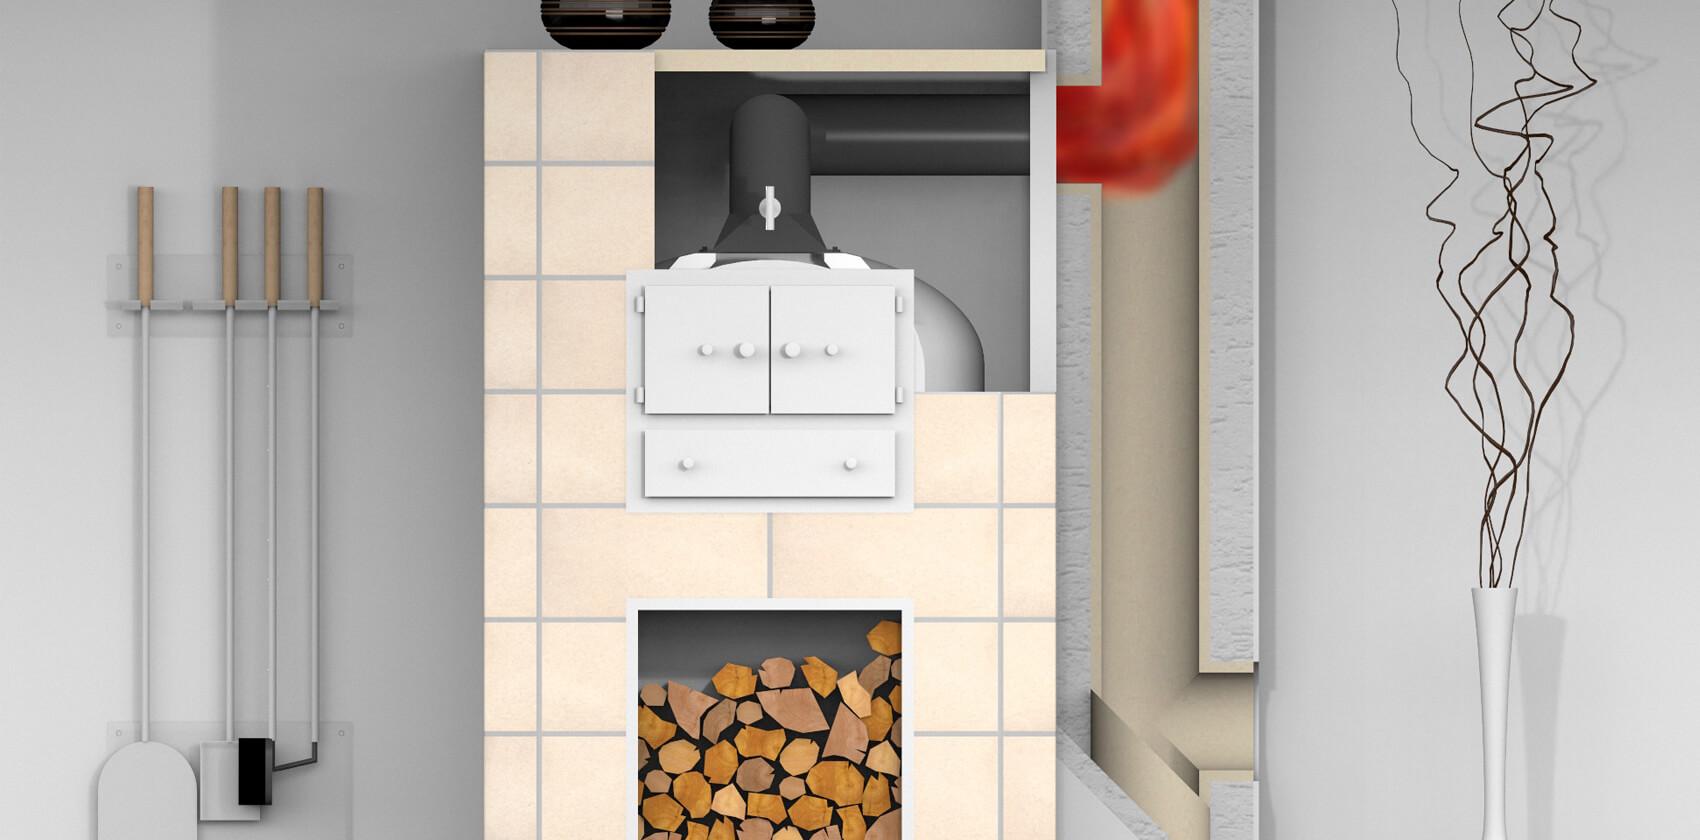 der backofen mit kachelofen spirit of fire. Black Bedroom Furniture Sets. Home Design Ideas